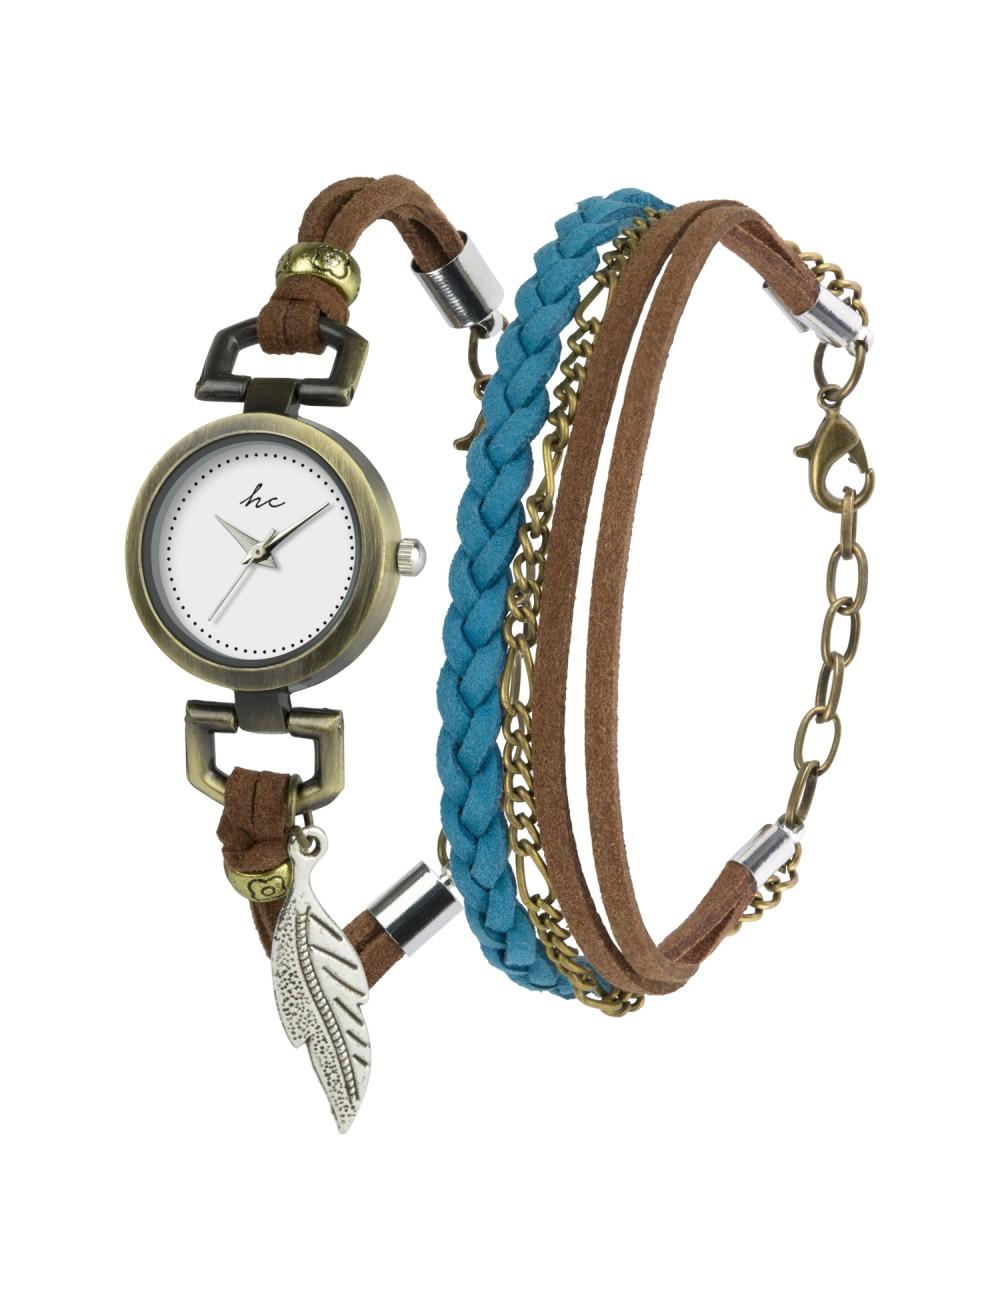 Hippie Chic Gift Set Watch & Bracelet B-TI-HCSAPP